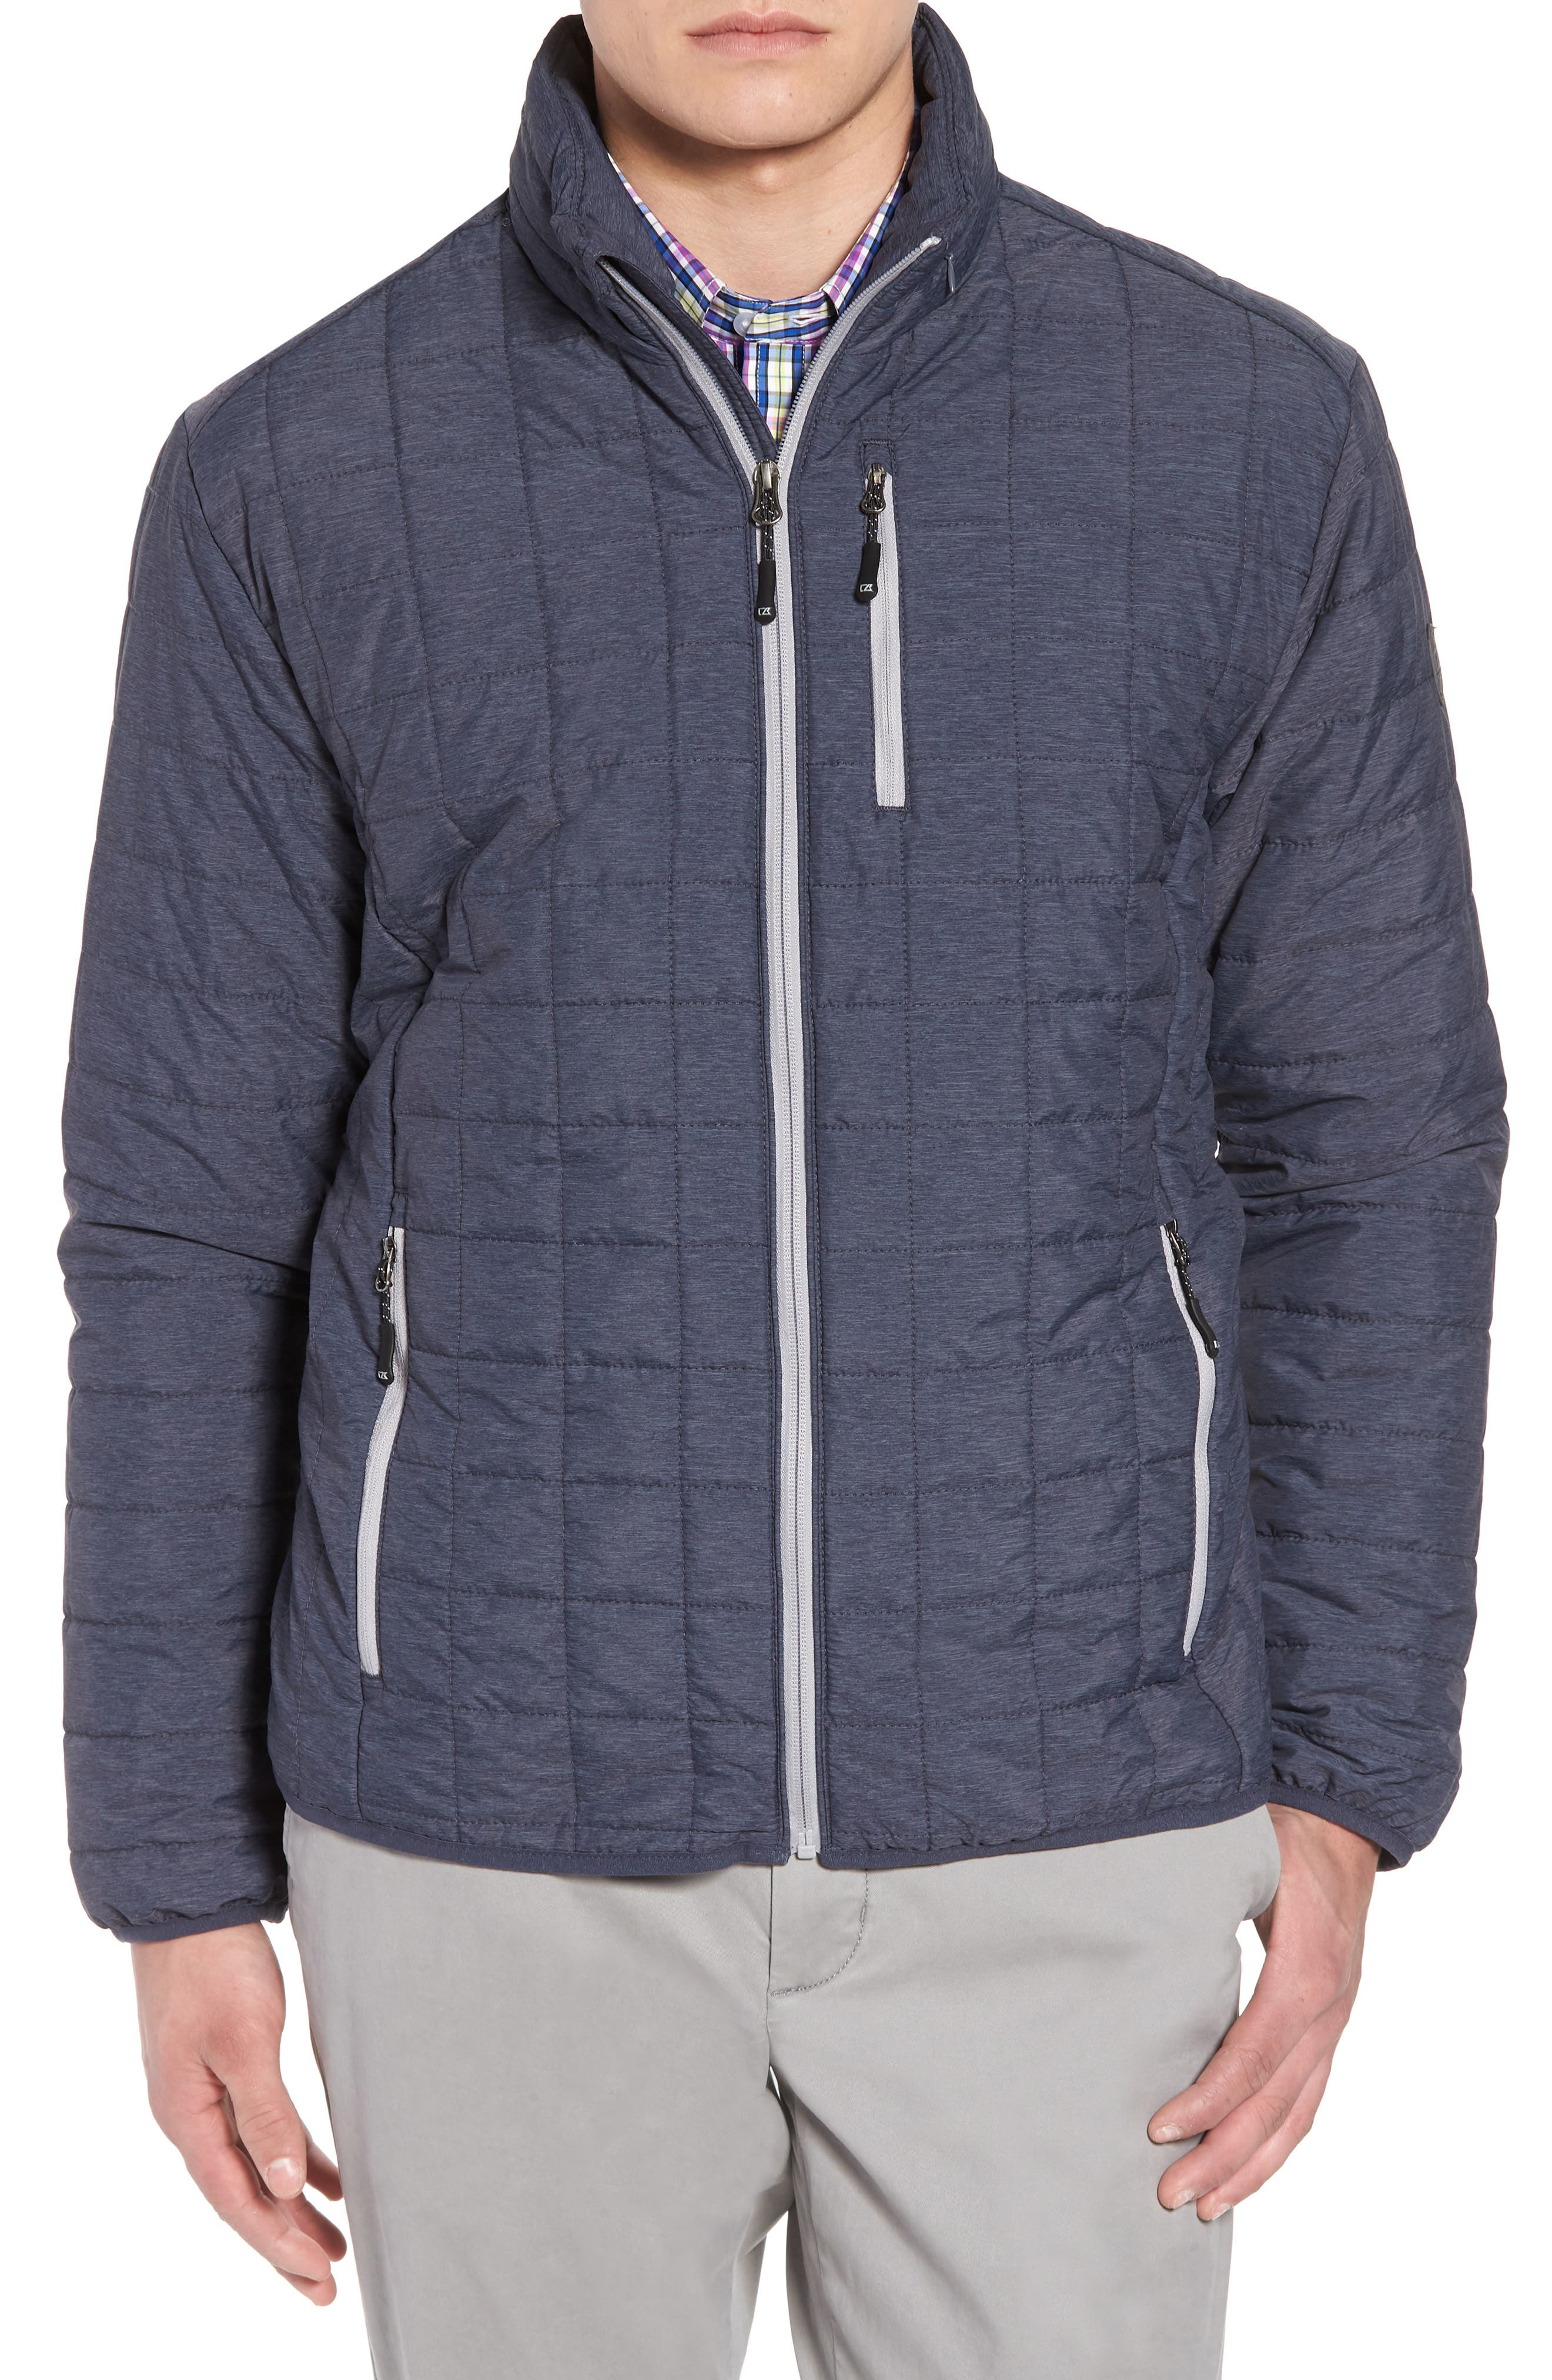 Cutter & Buck Rainier Classic Fit Jacket, Grey